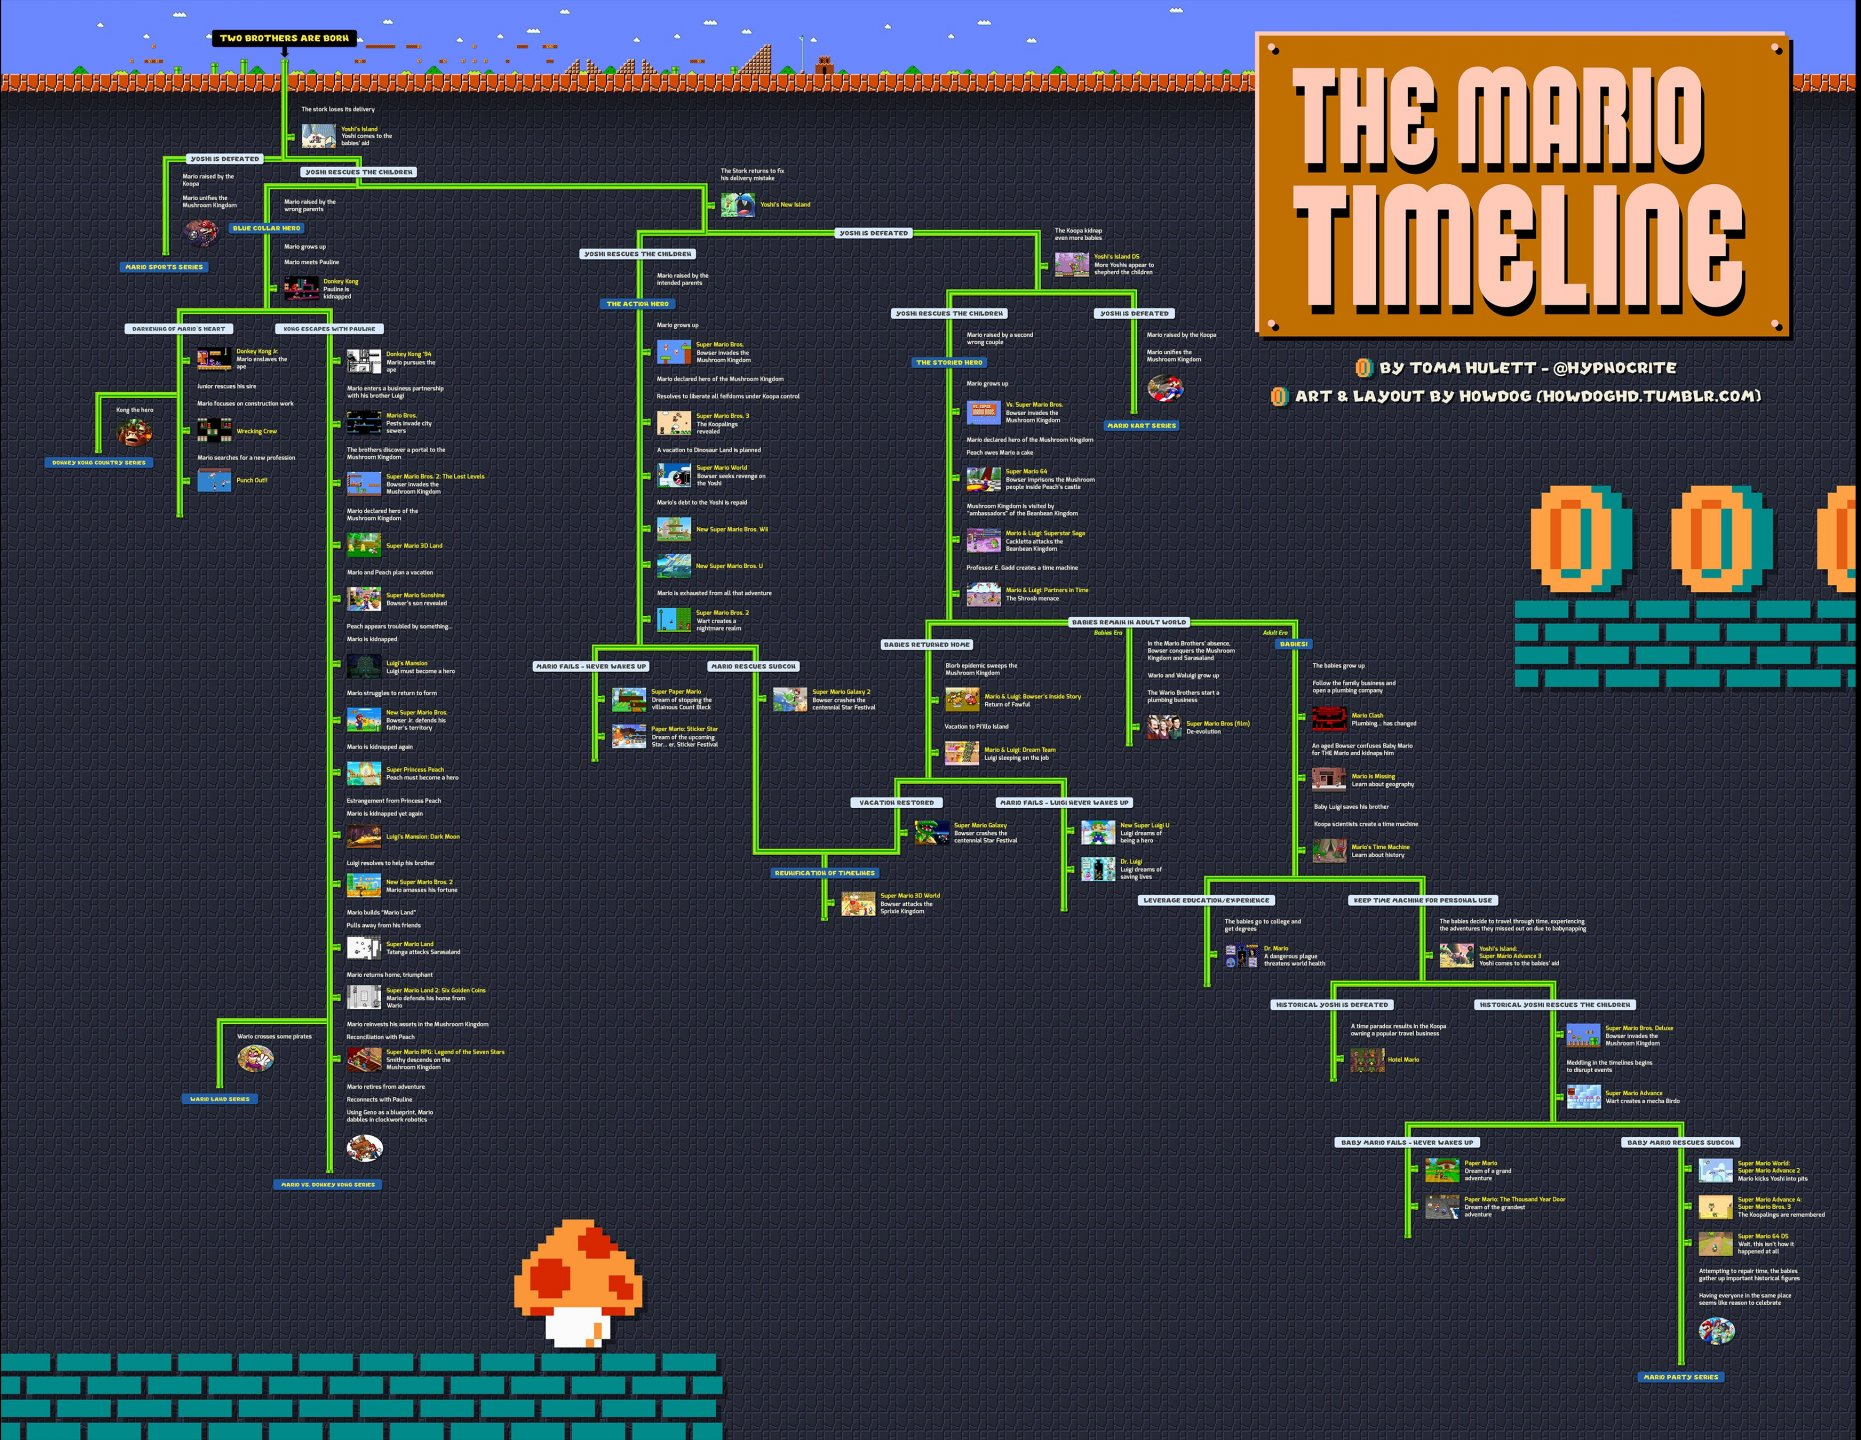 Mario-Timeline-Smaller-Web2-noscale.jpg